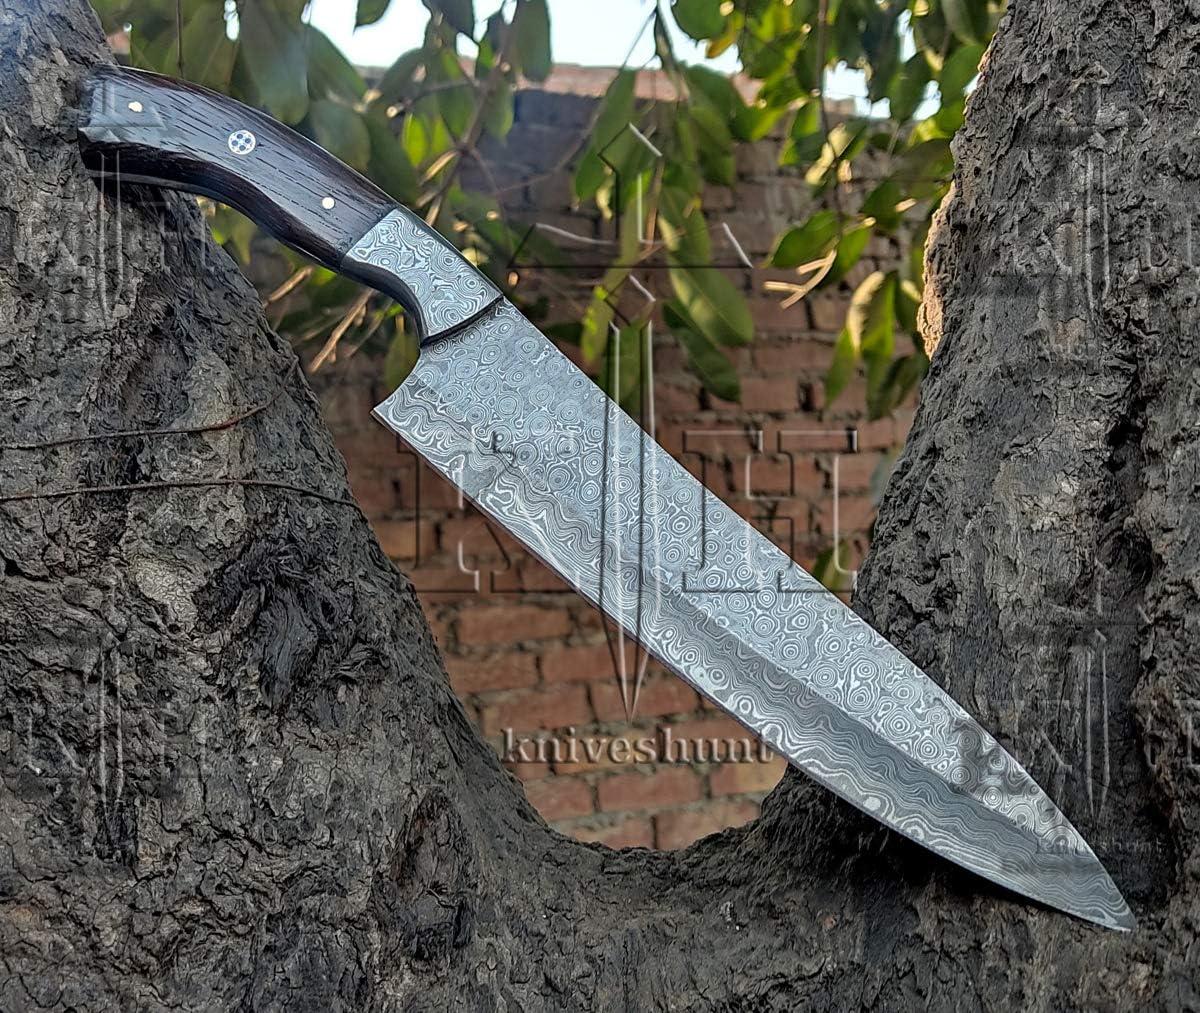 Custom 2021 new Max 54% OFF handmade Damascus knife-13 knife Ste Chef Inches